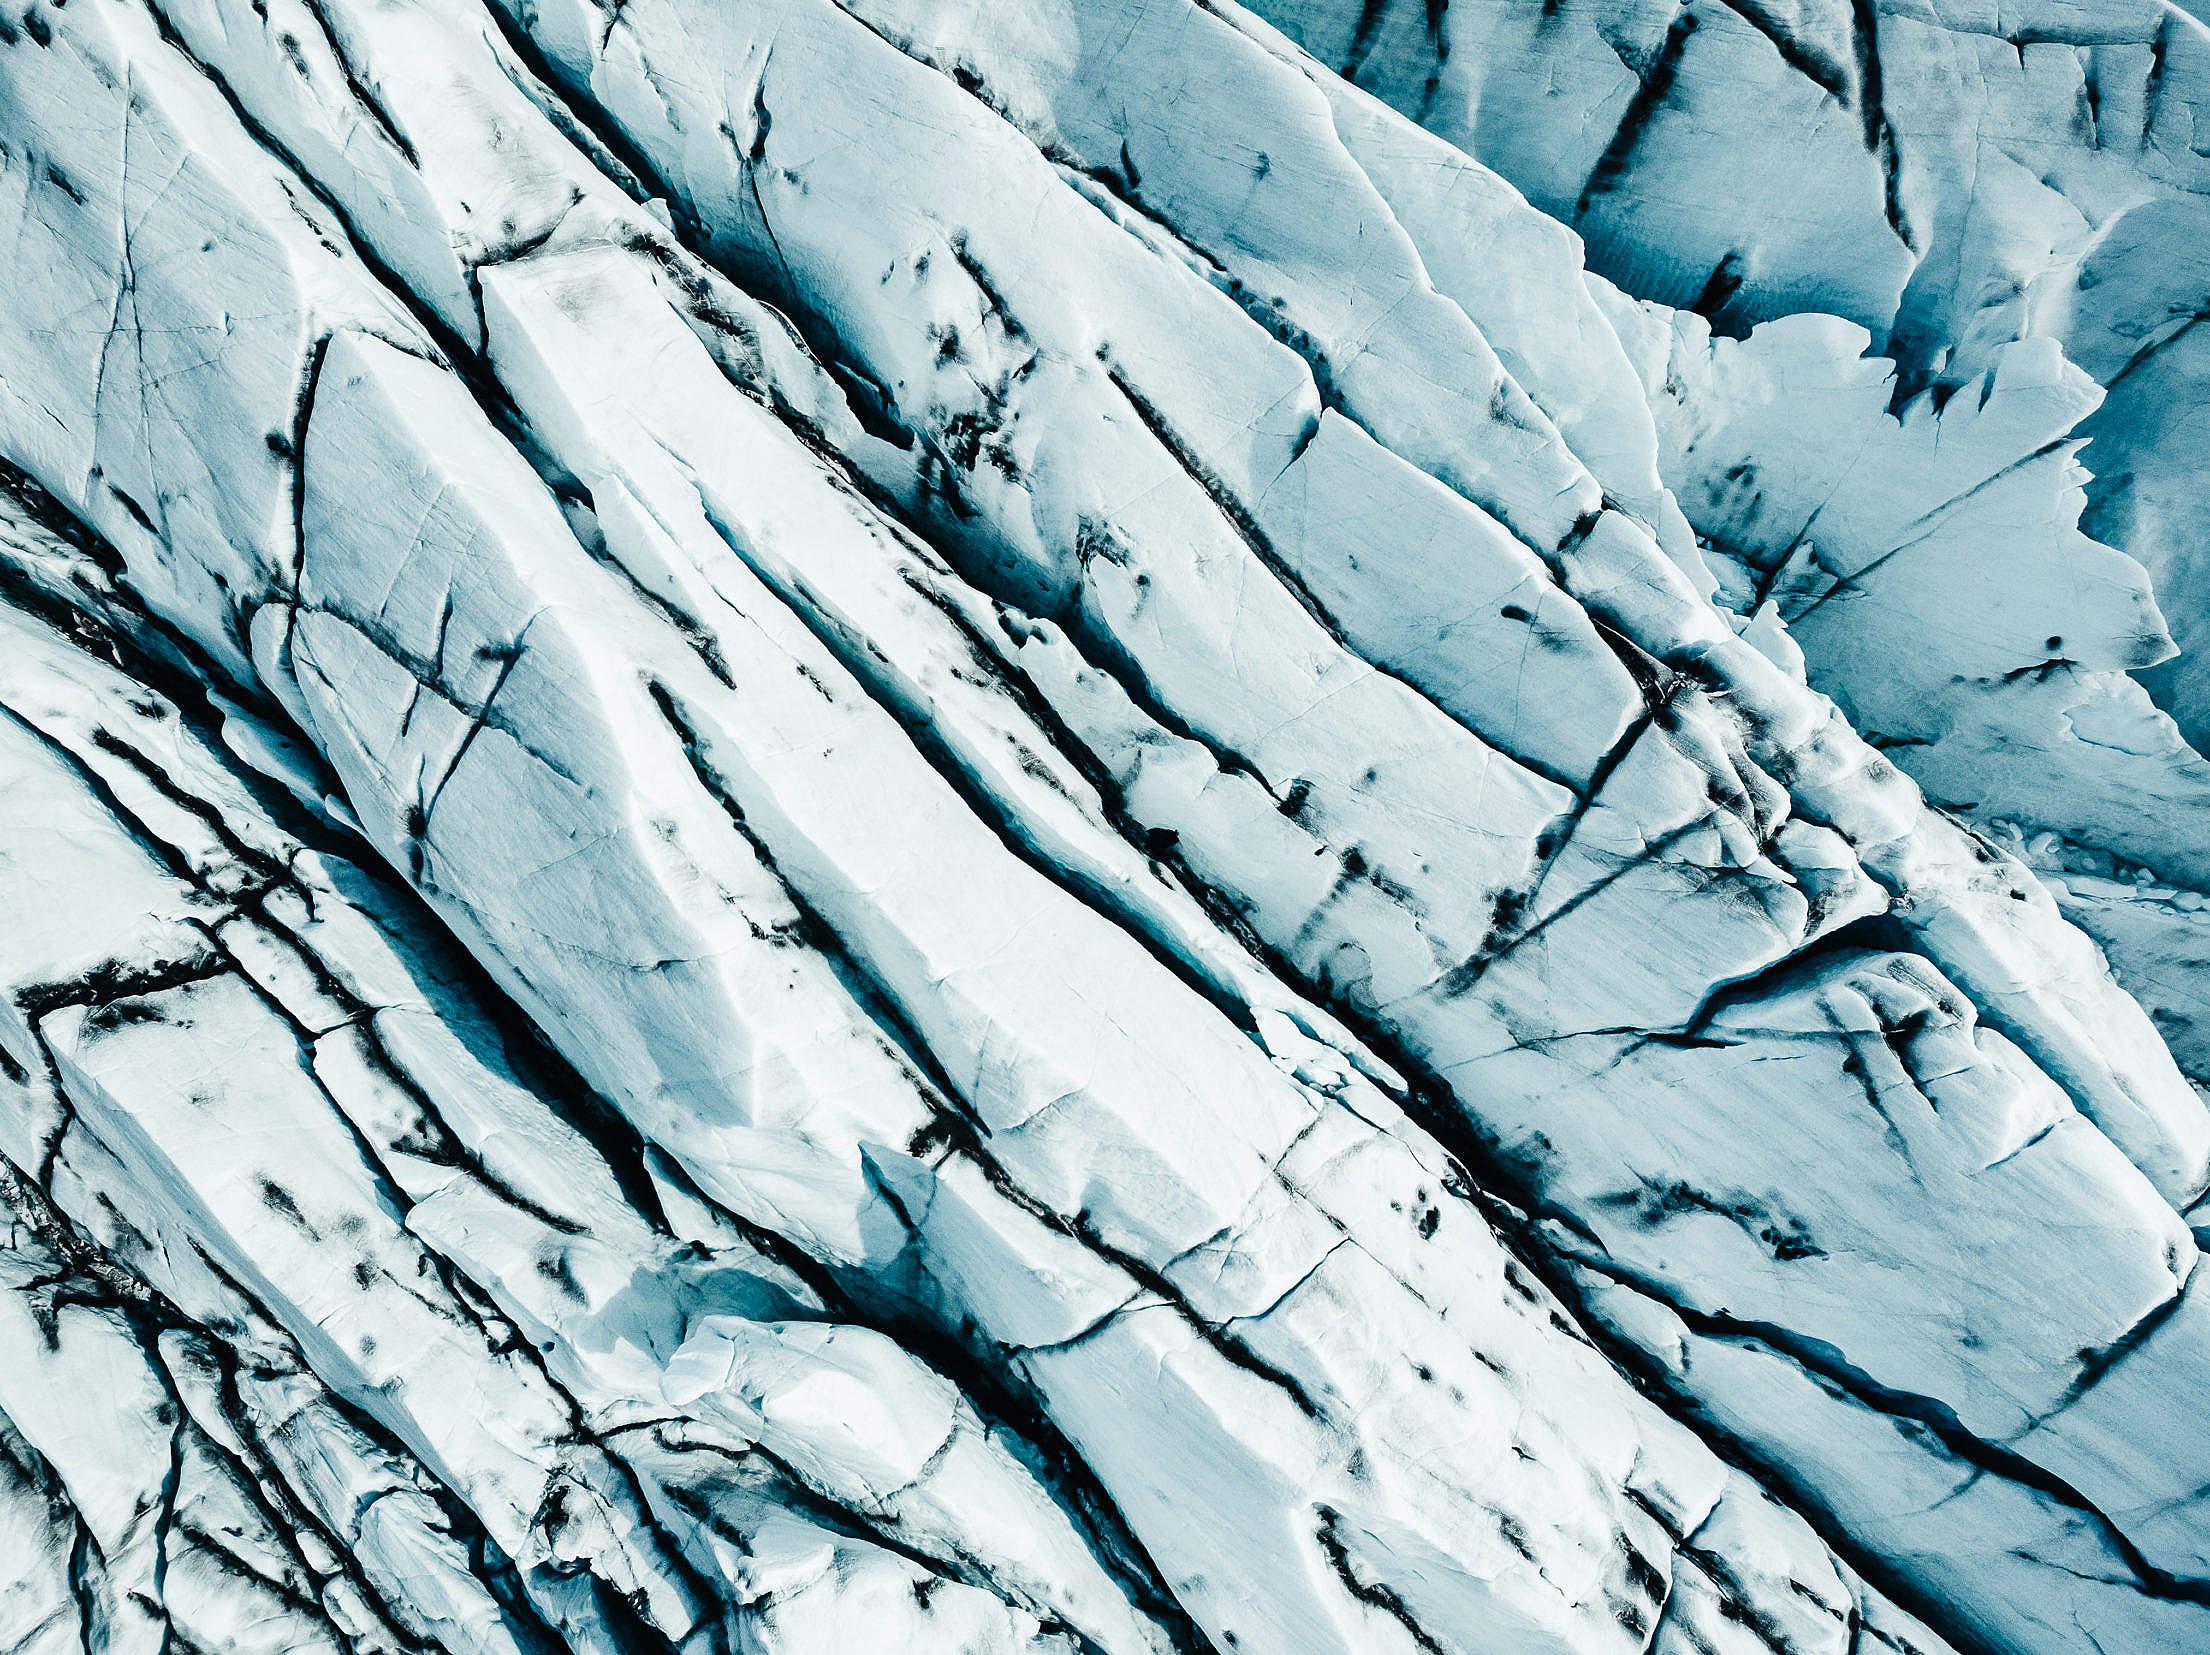 Glacier Texture Free Stock Photo